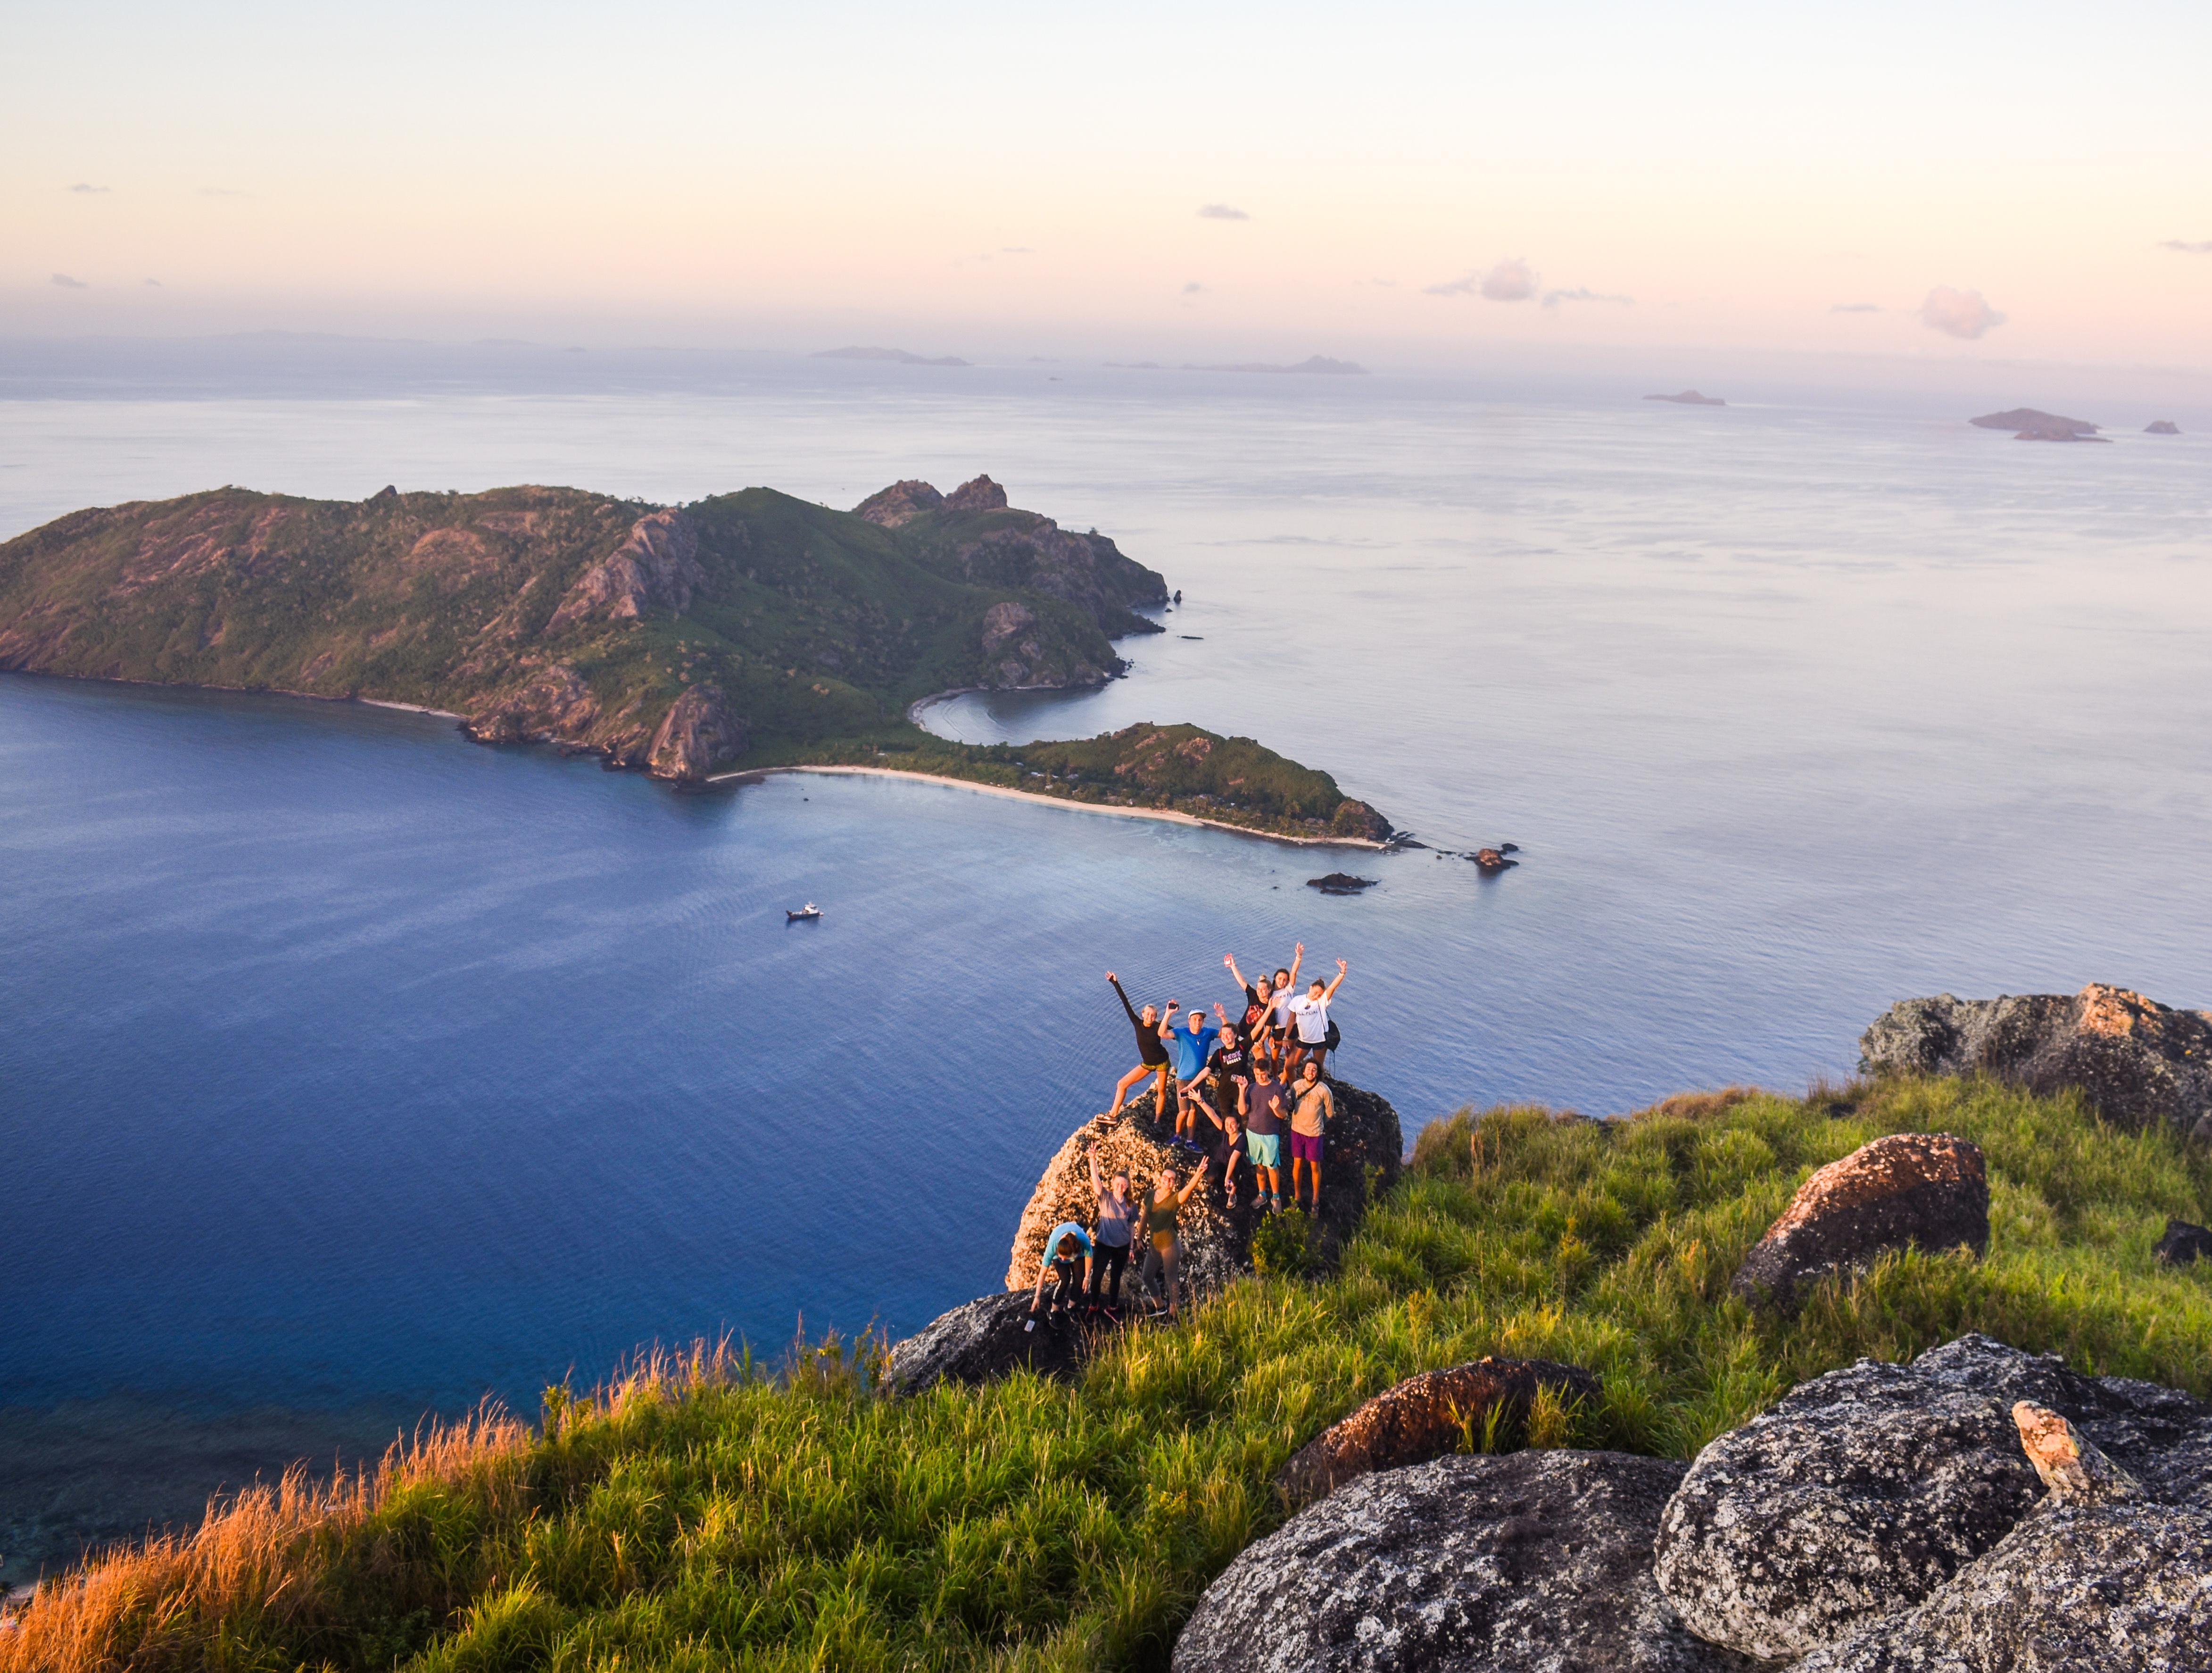 Summer Program - Promoting Volunteerism | Travel For Teens: Australia, New Zealand and Fiji Service